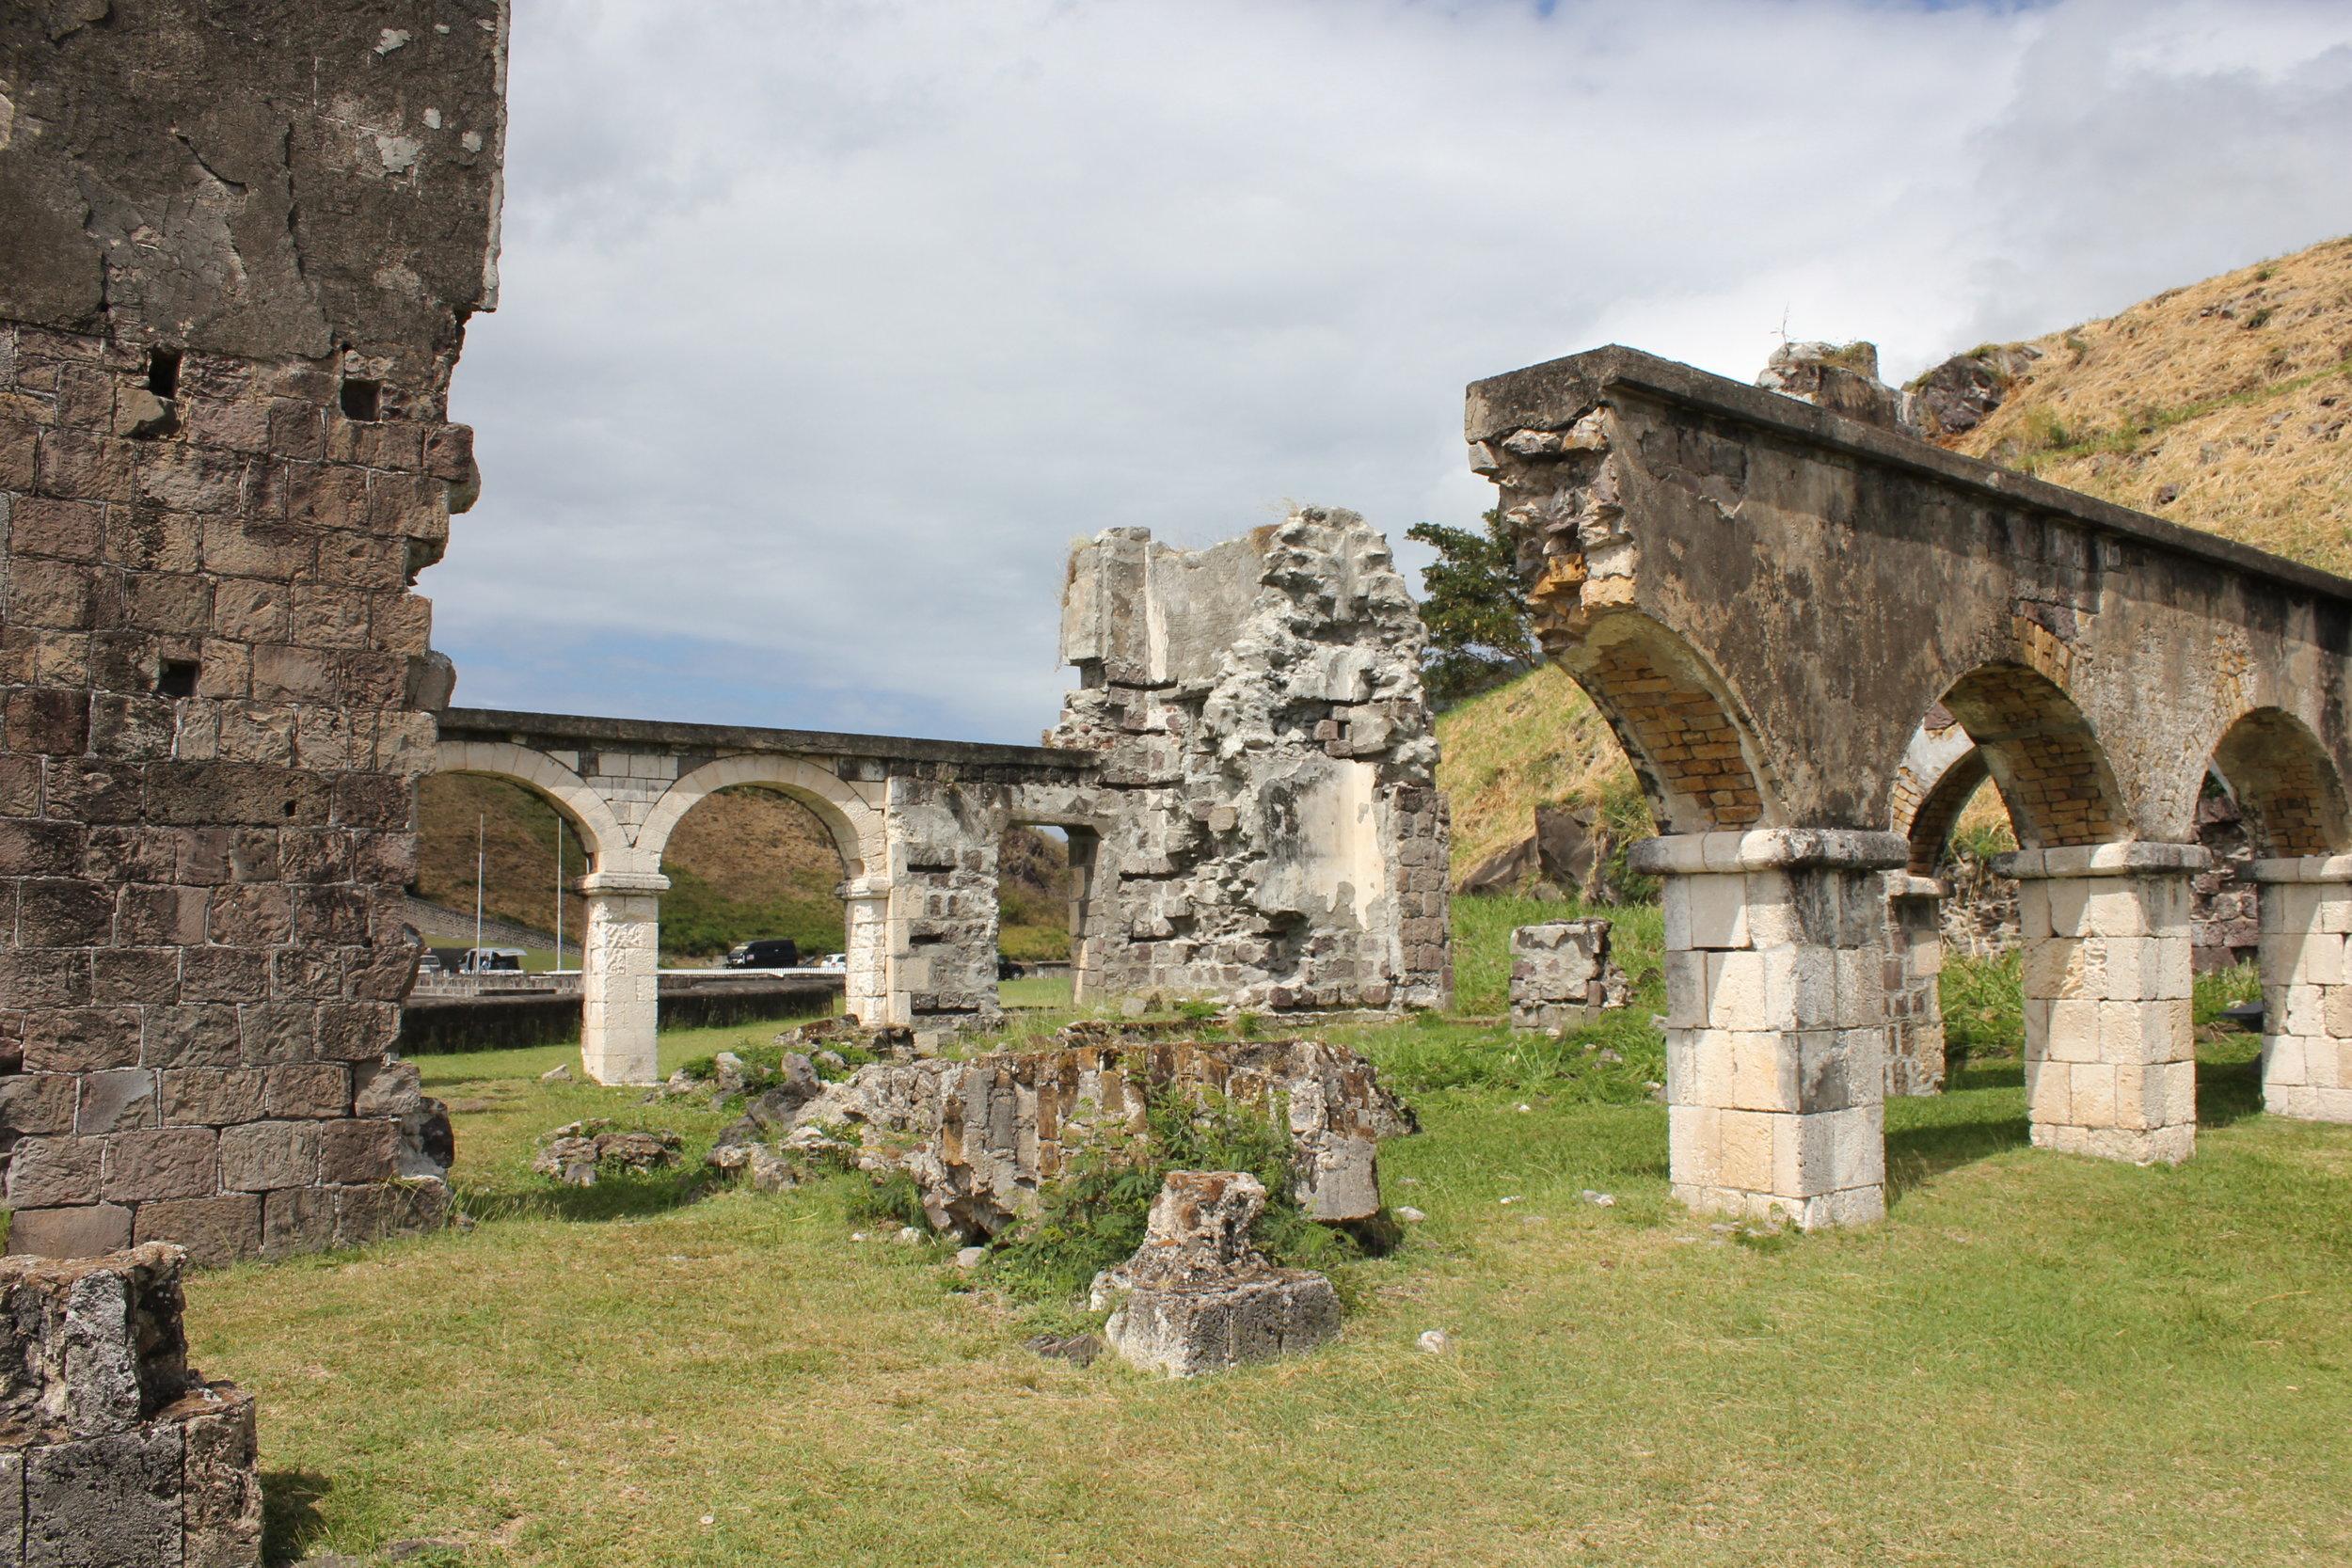 Brimstone Hill Fortress National Park – Ruins